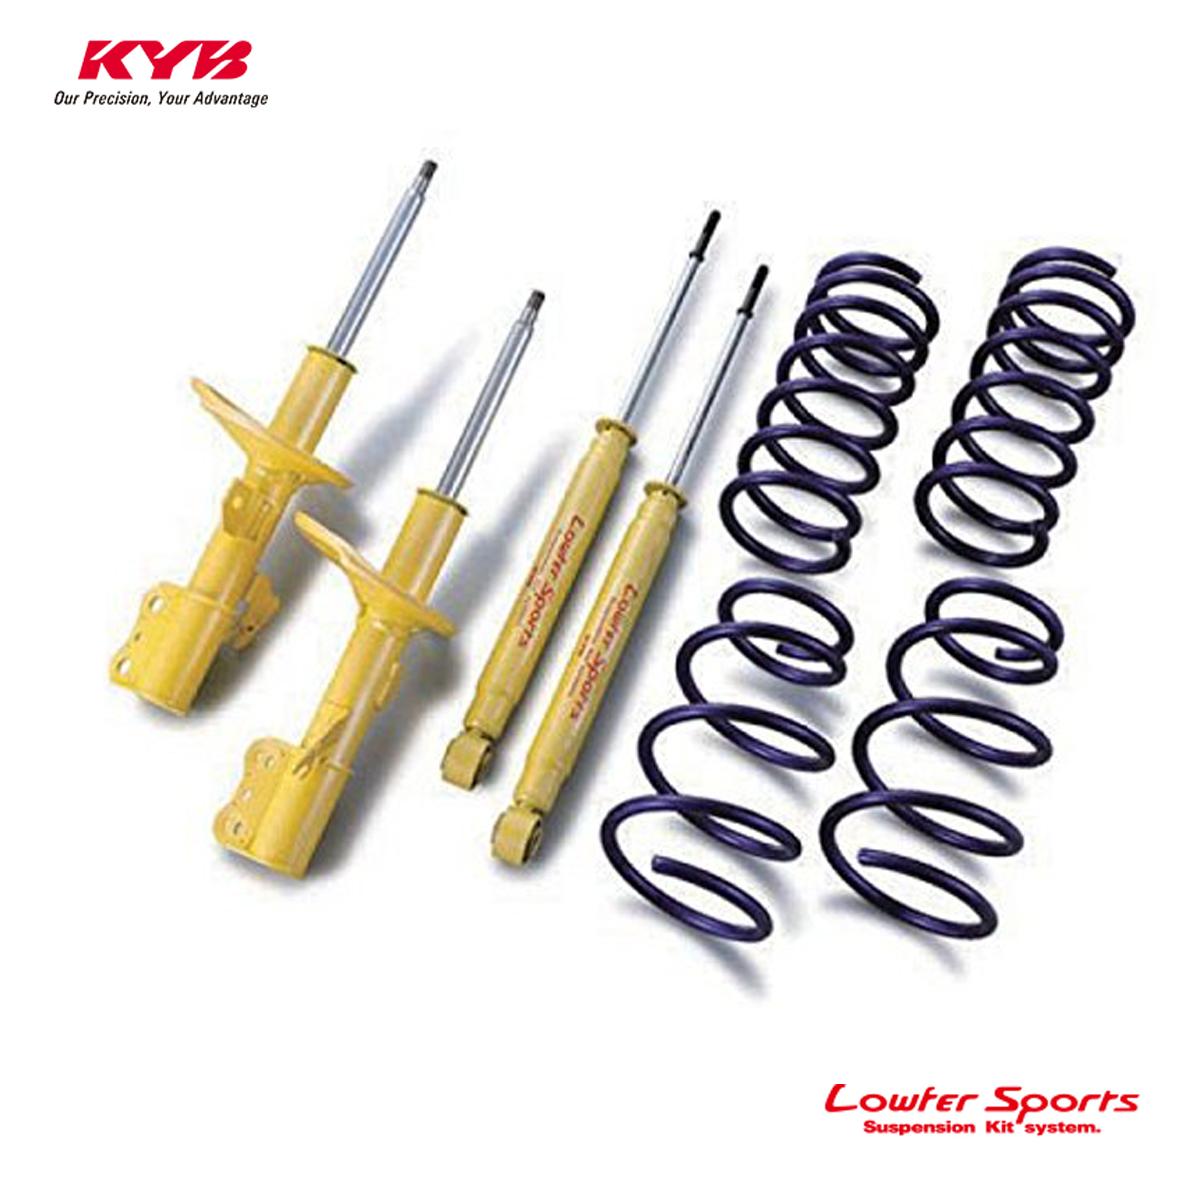 KYB カヤバ フィット GD1/3 ショックアブソーバー サスペンションキット Lowfer Sports LKIT-GD3 配送先条件有り